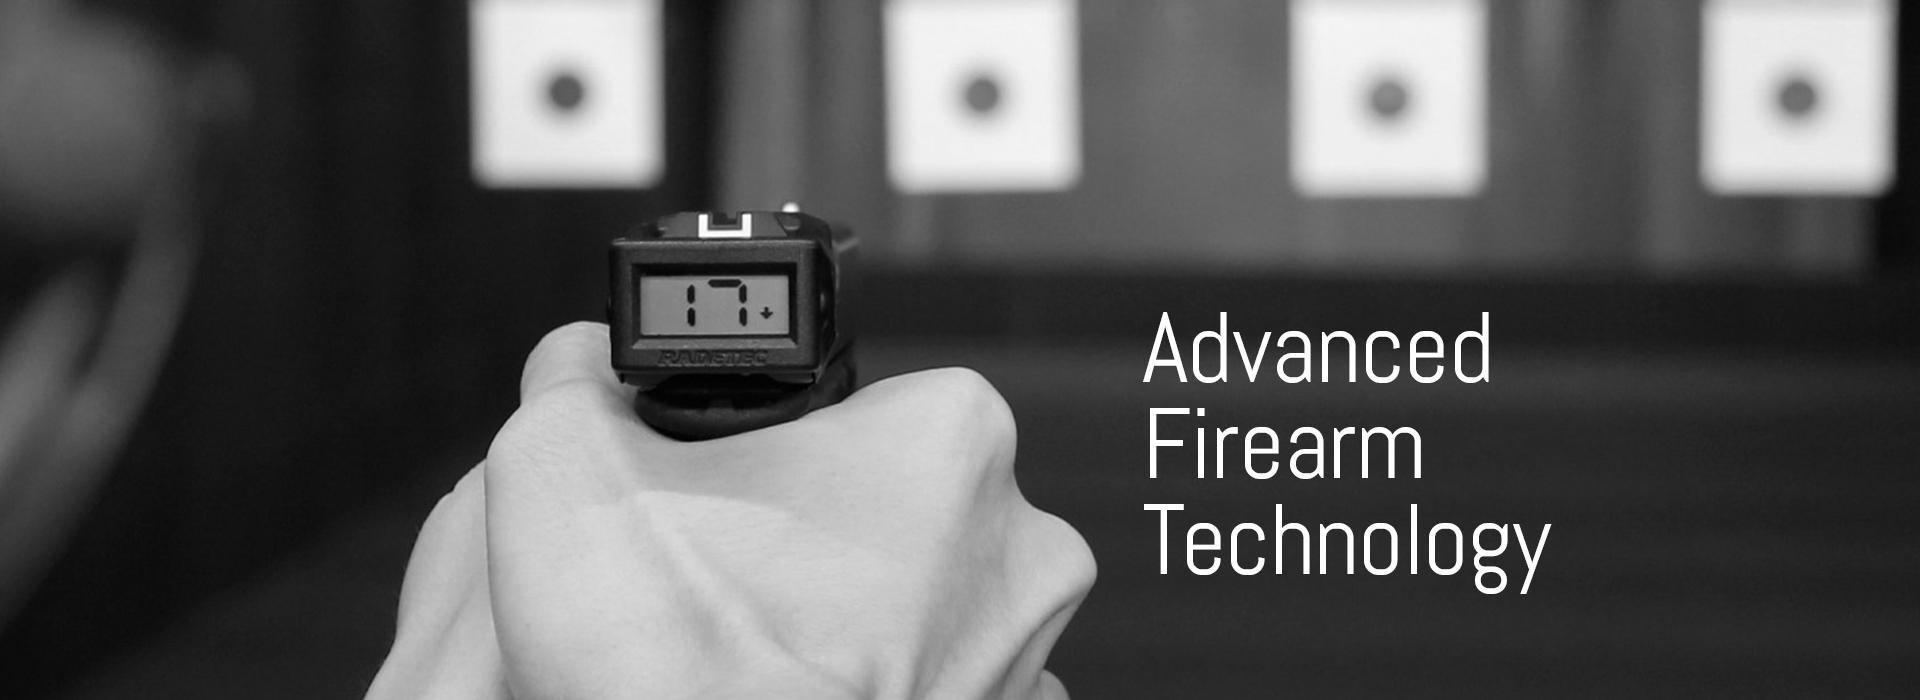 Advanced Firearm Technology 0216201228